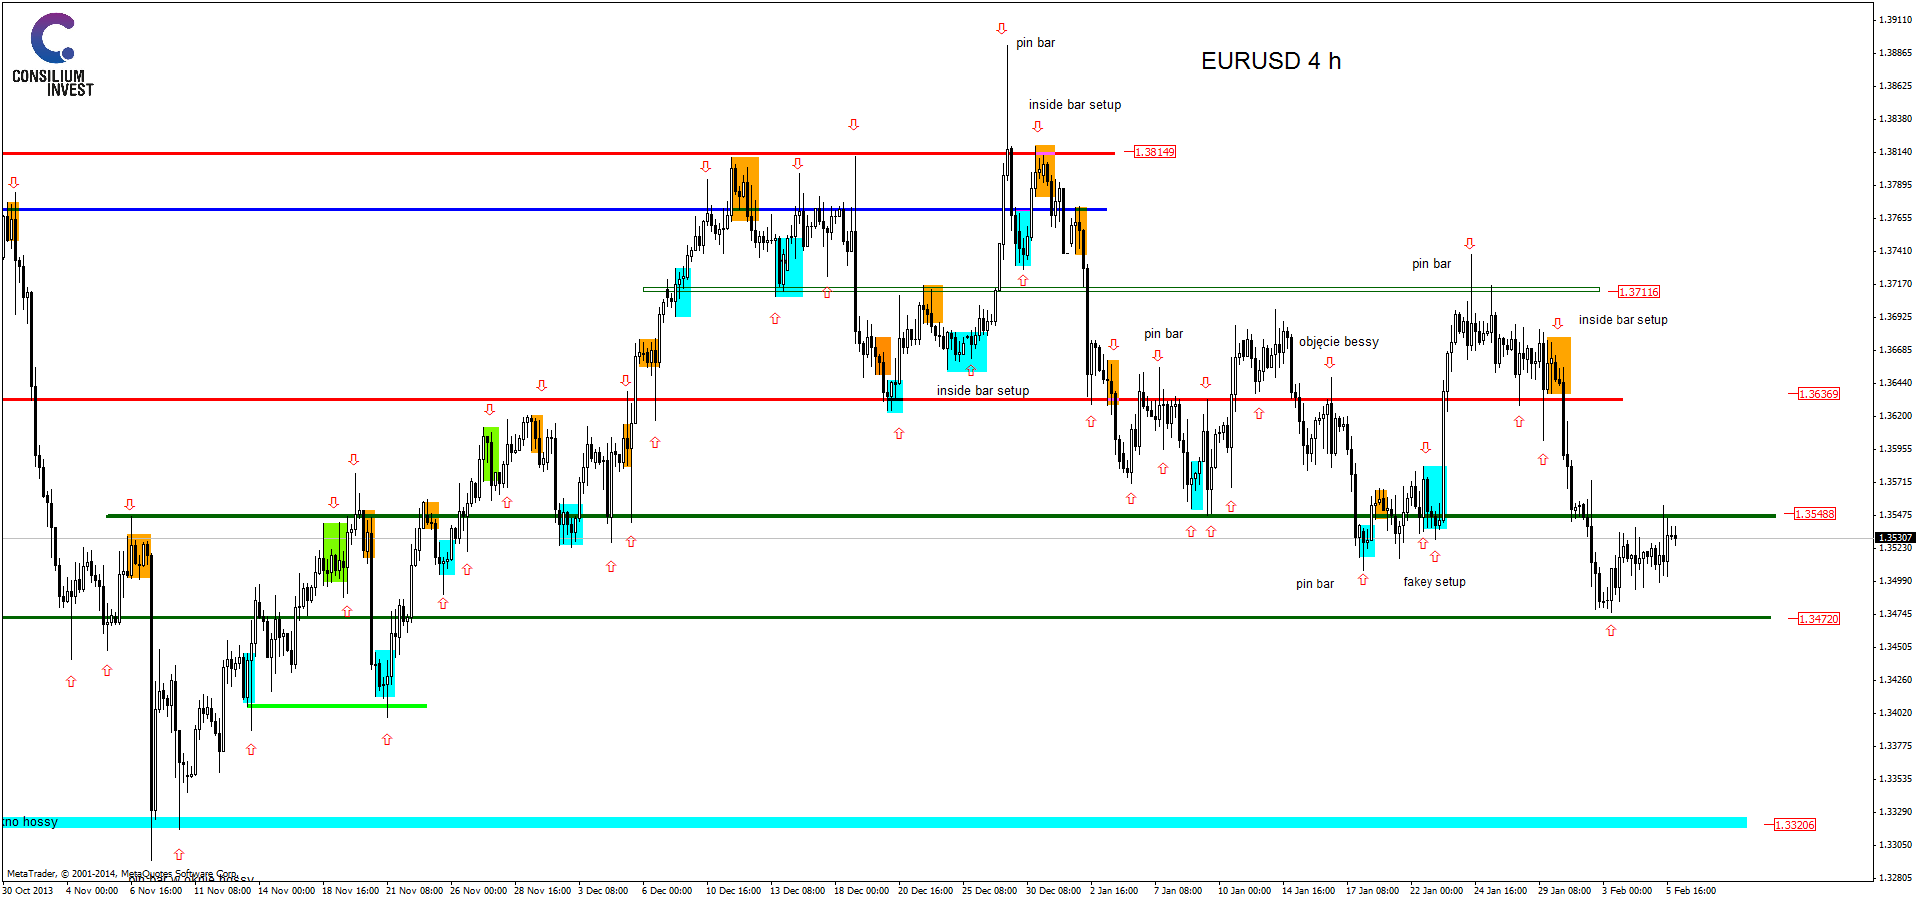 analiza techniczna eurusdh4_5_2